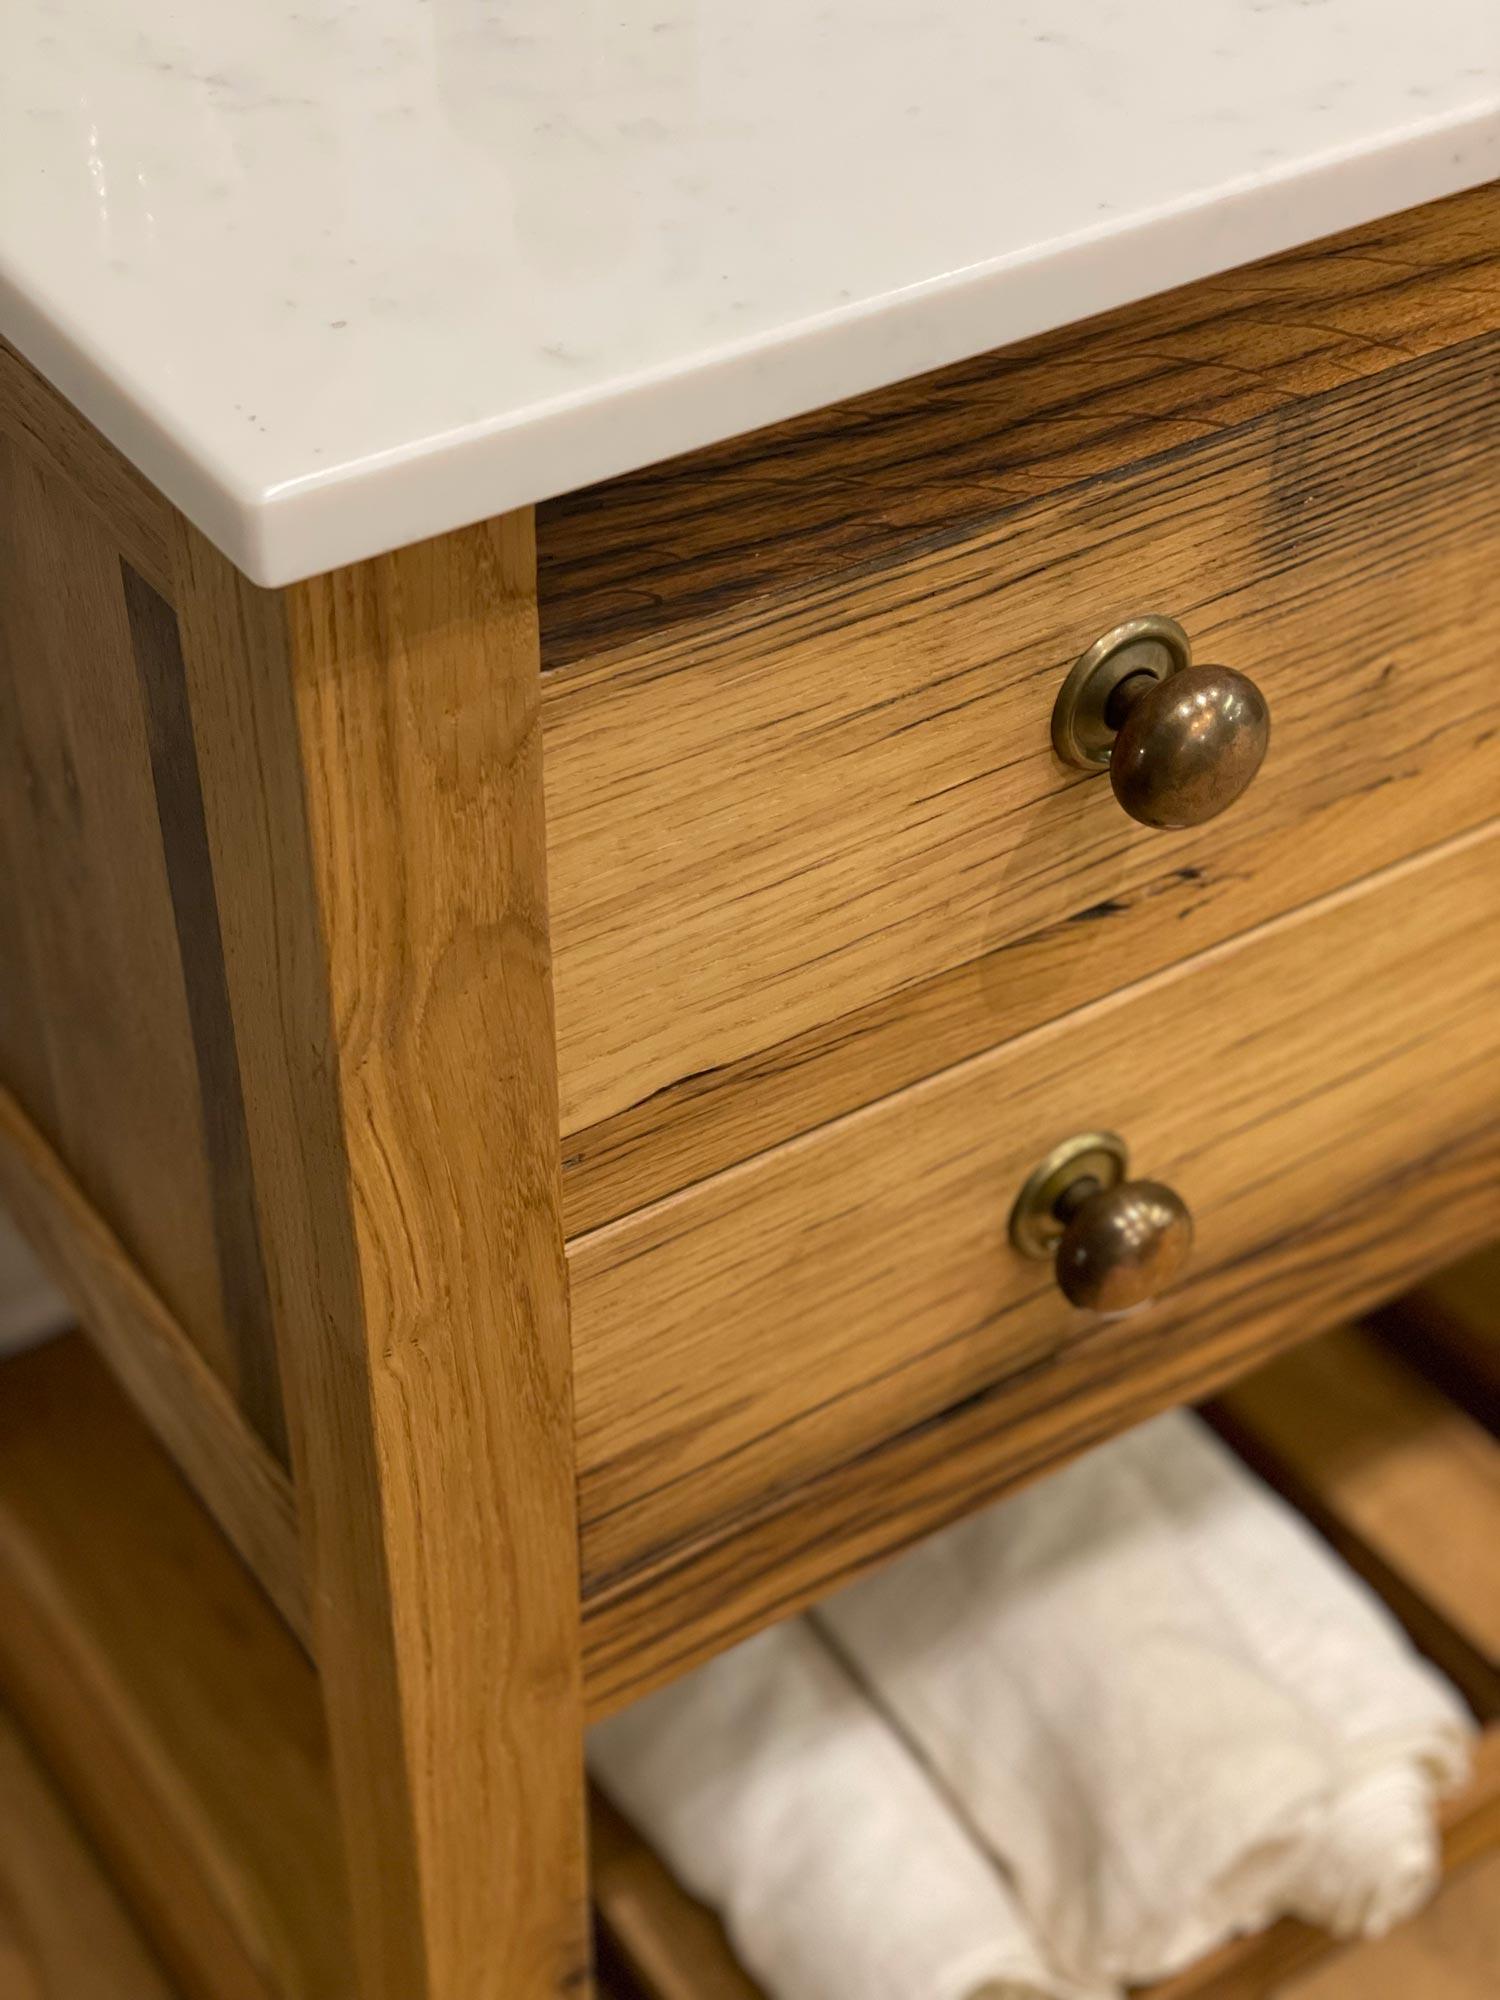 Burnt brass knobs on vanity unit